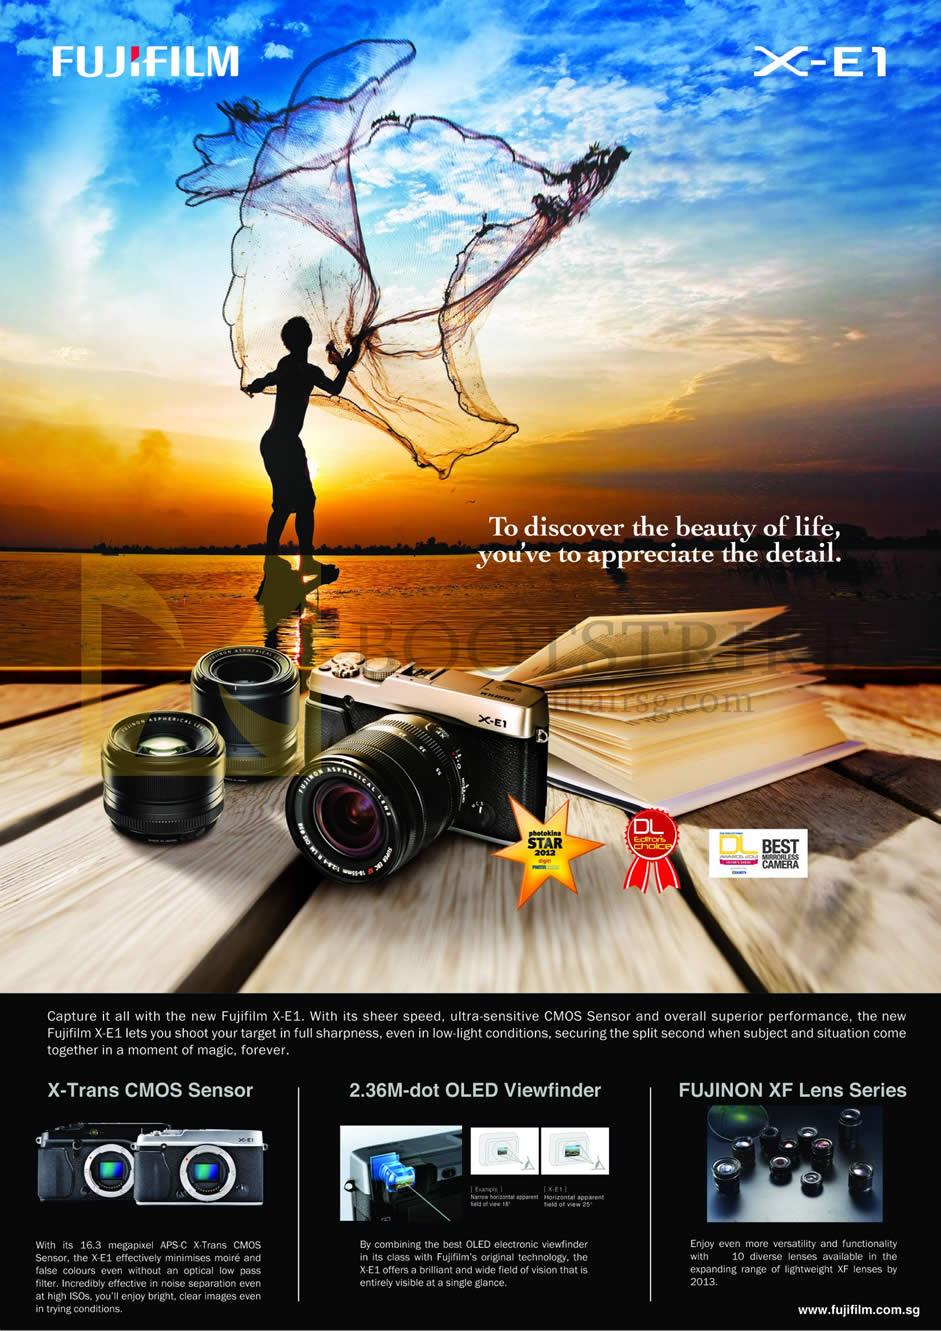 IT SHOW 2013 price list image brochure of Fujifilm Digital Camera X-E1 Features, X-Trans CMOS Sensor, OLED